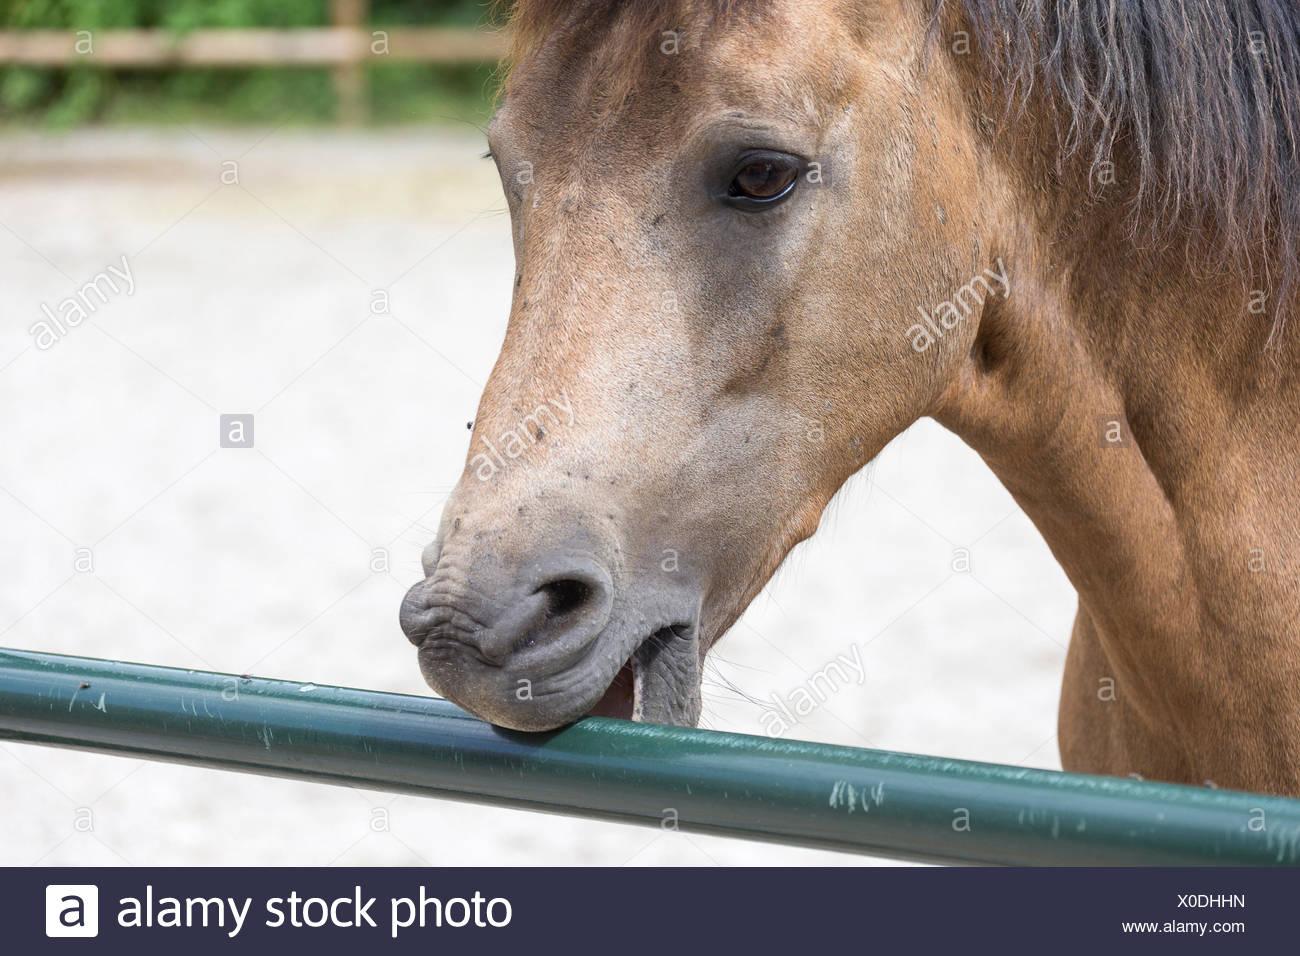 Pony cribbing at fence - Stock Image